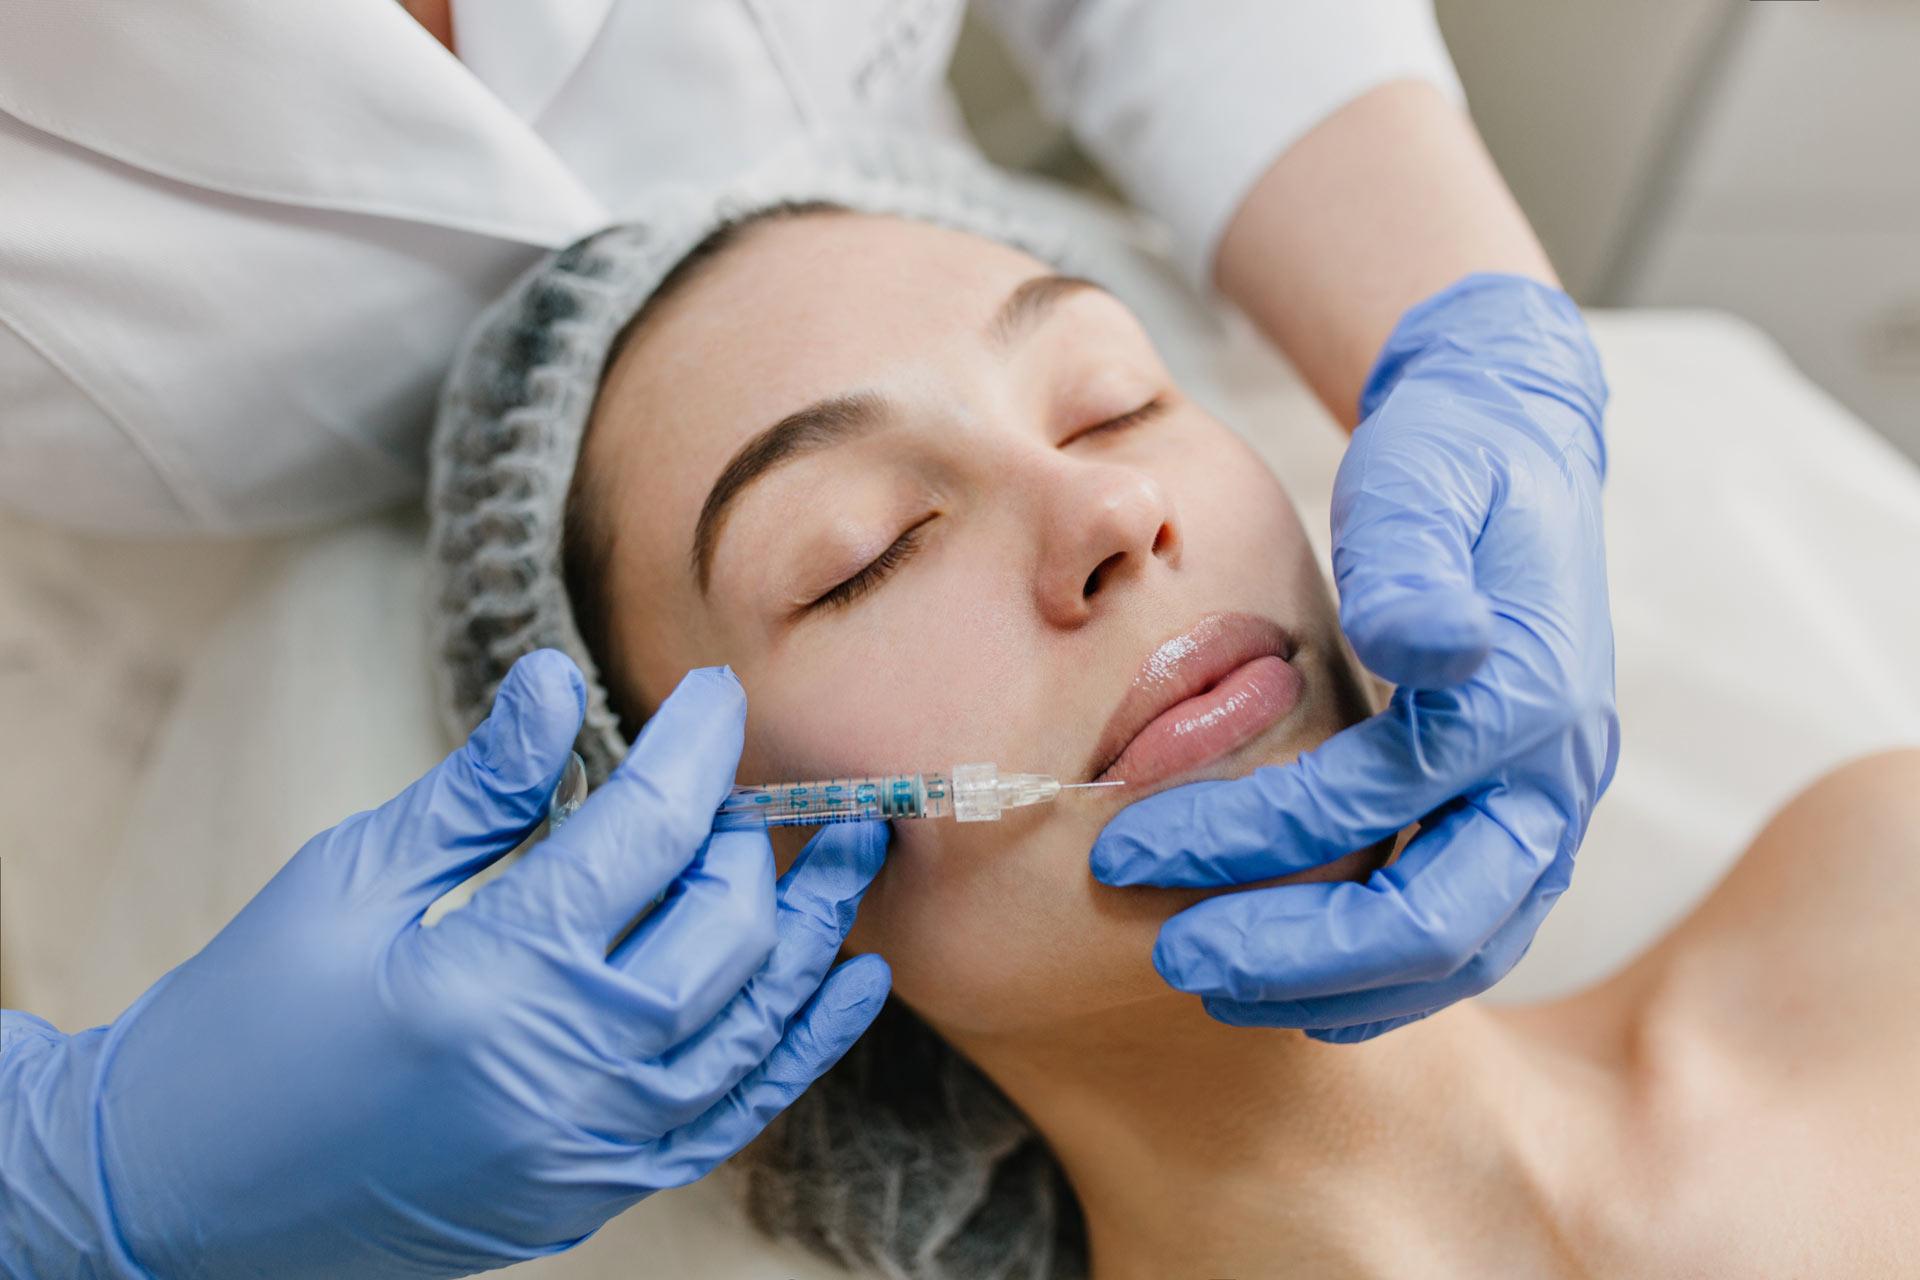 Does Botox Help Under Eyes?